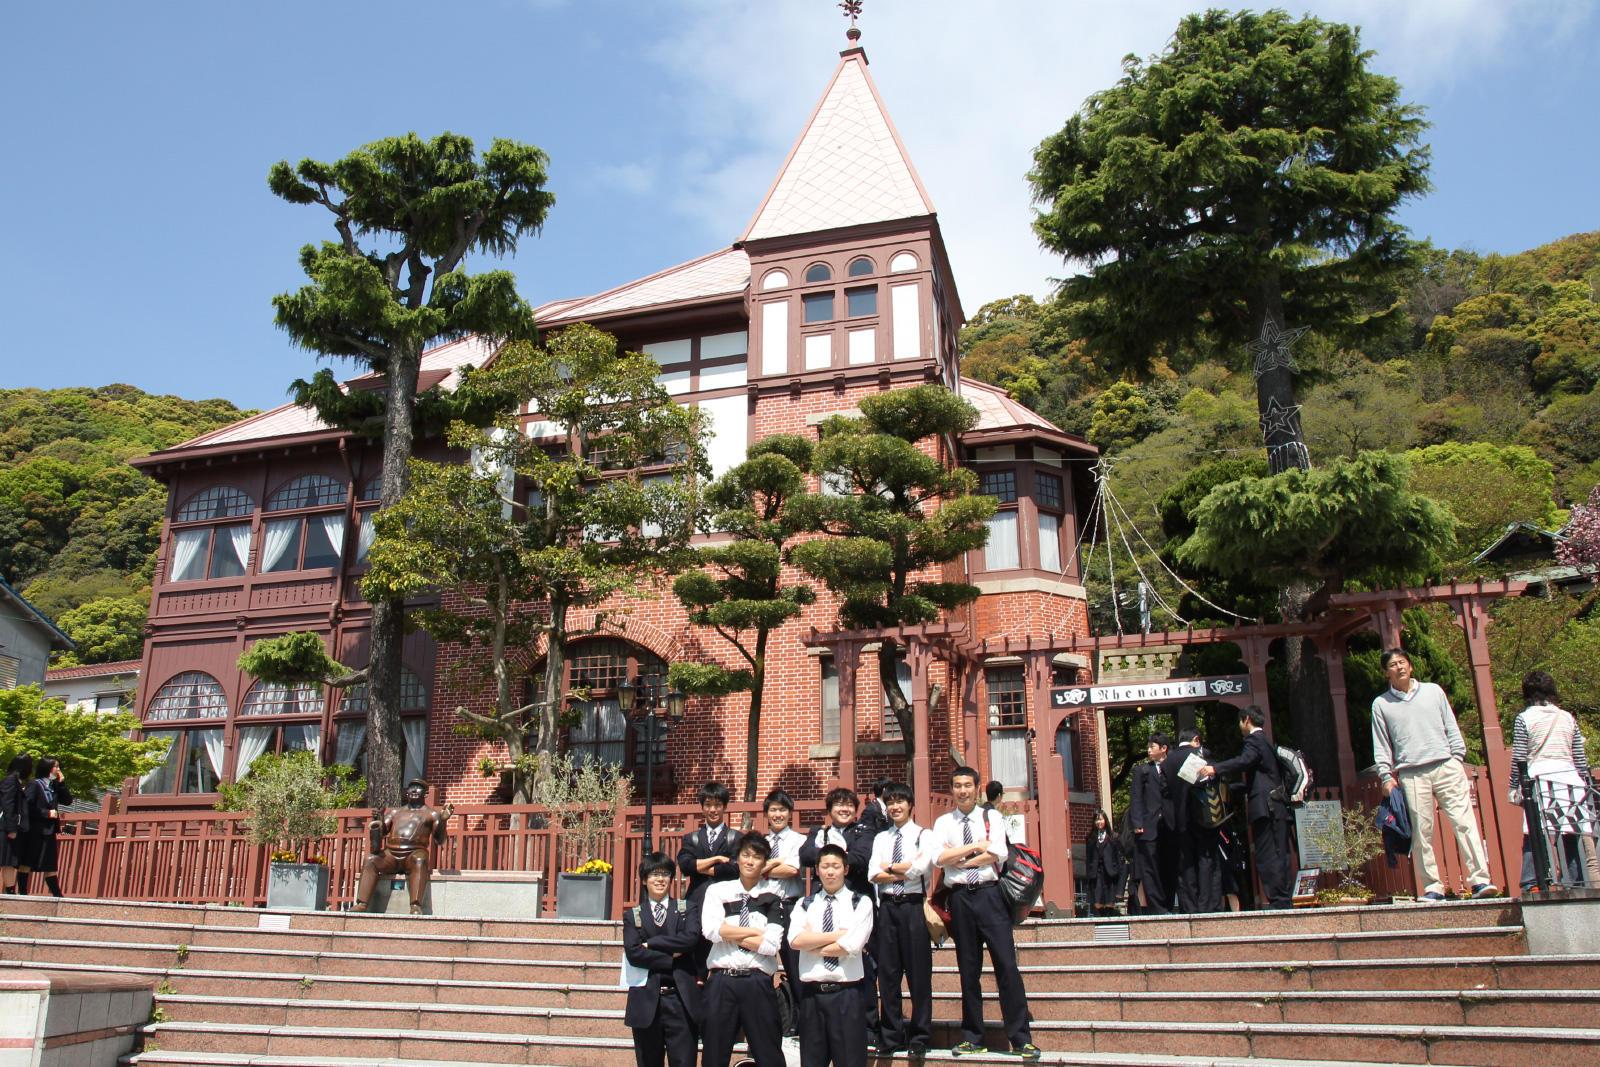 http://www.kyoto-be.ne.jp/nishijyouyou-hs/mt/schoollife/images/20170425_3nen_img_2298.jpg